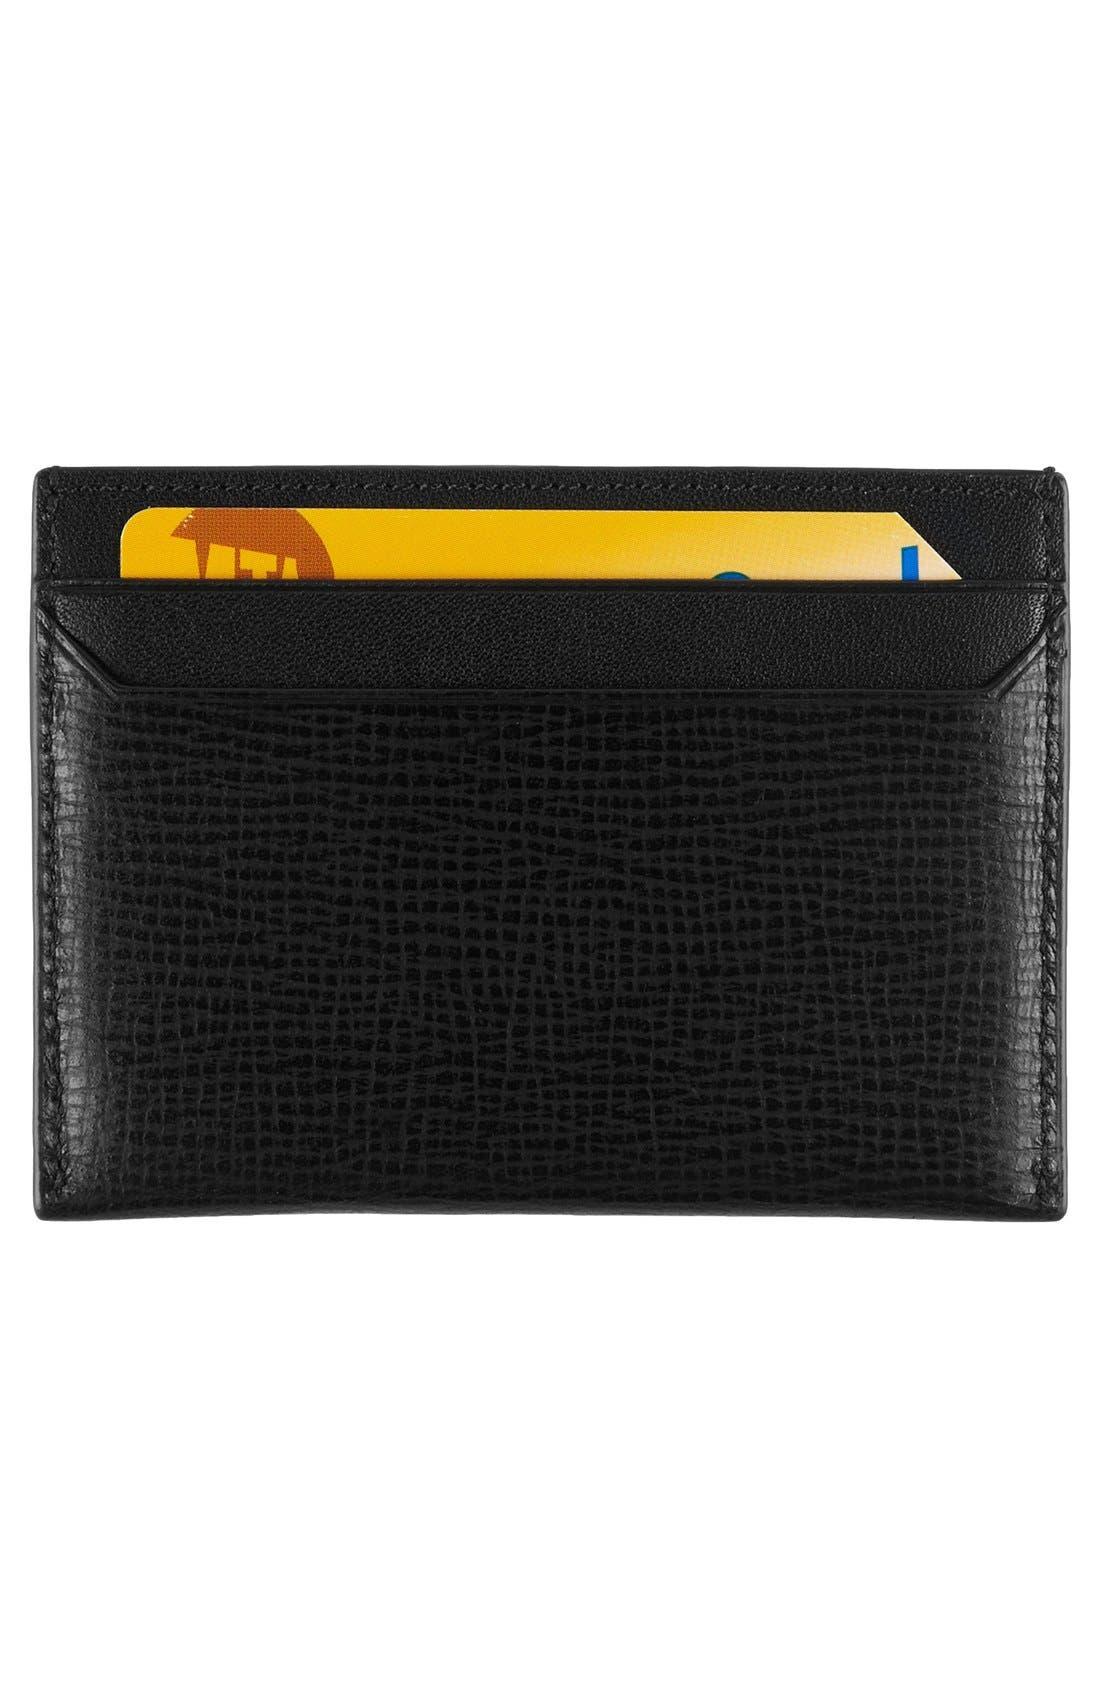 Monaco Slim Leather Card Case,                             Alternate thumbnail 2, color,                             001